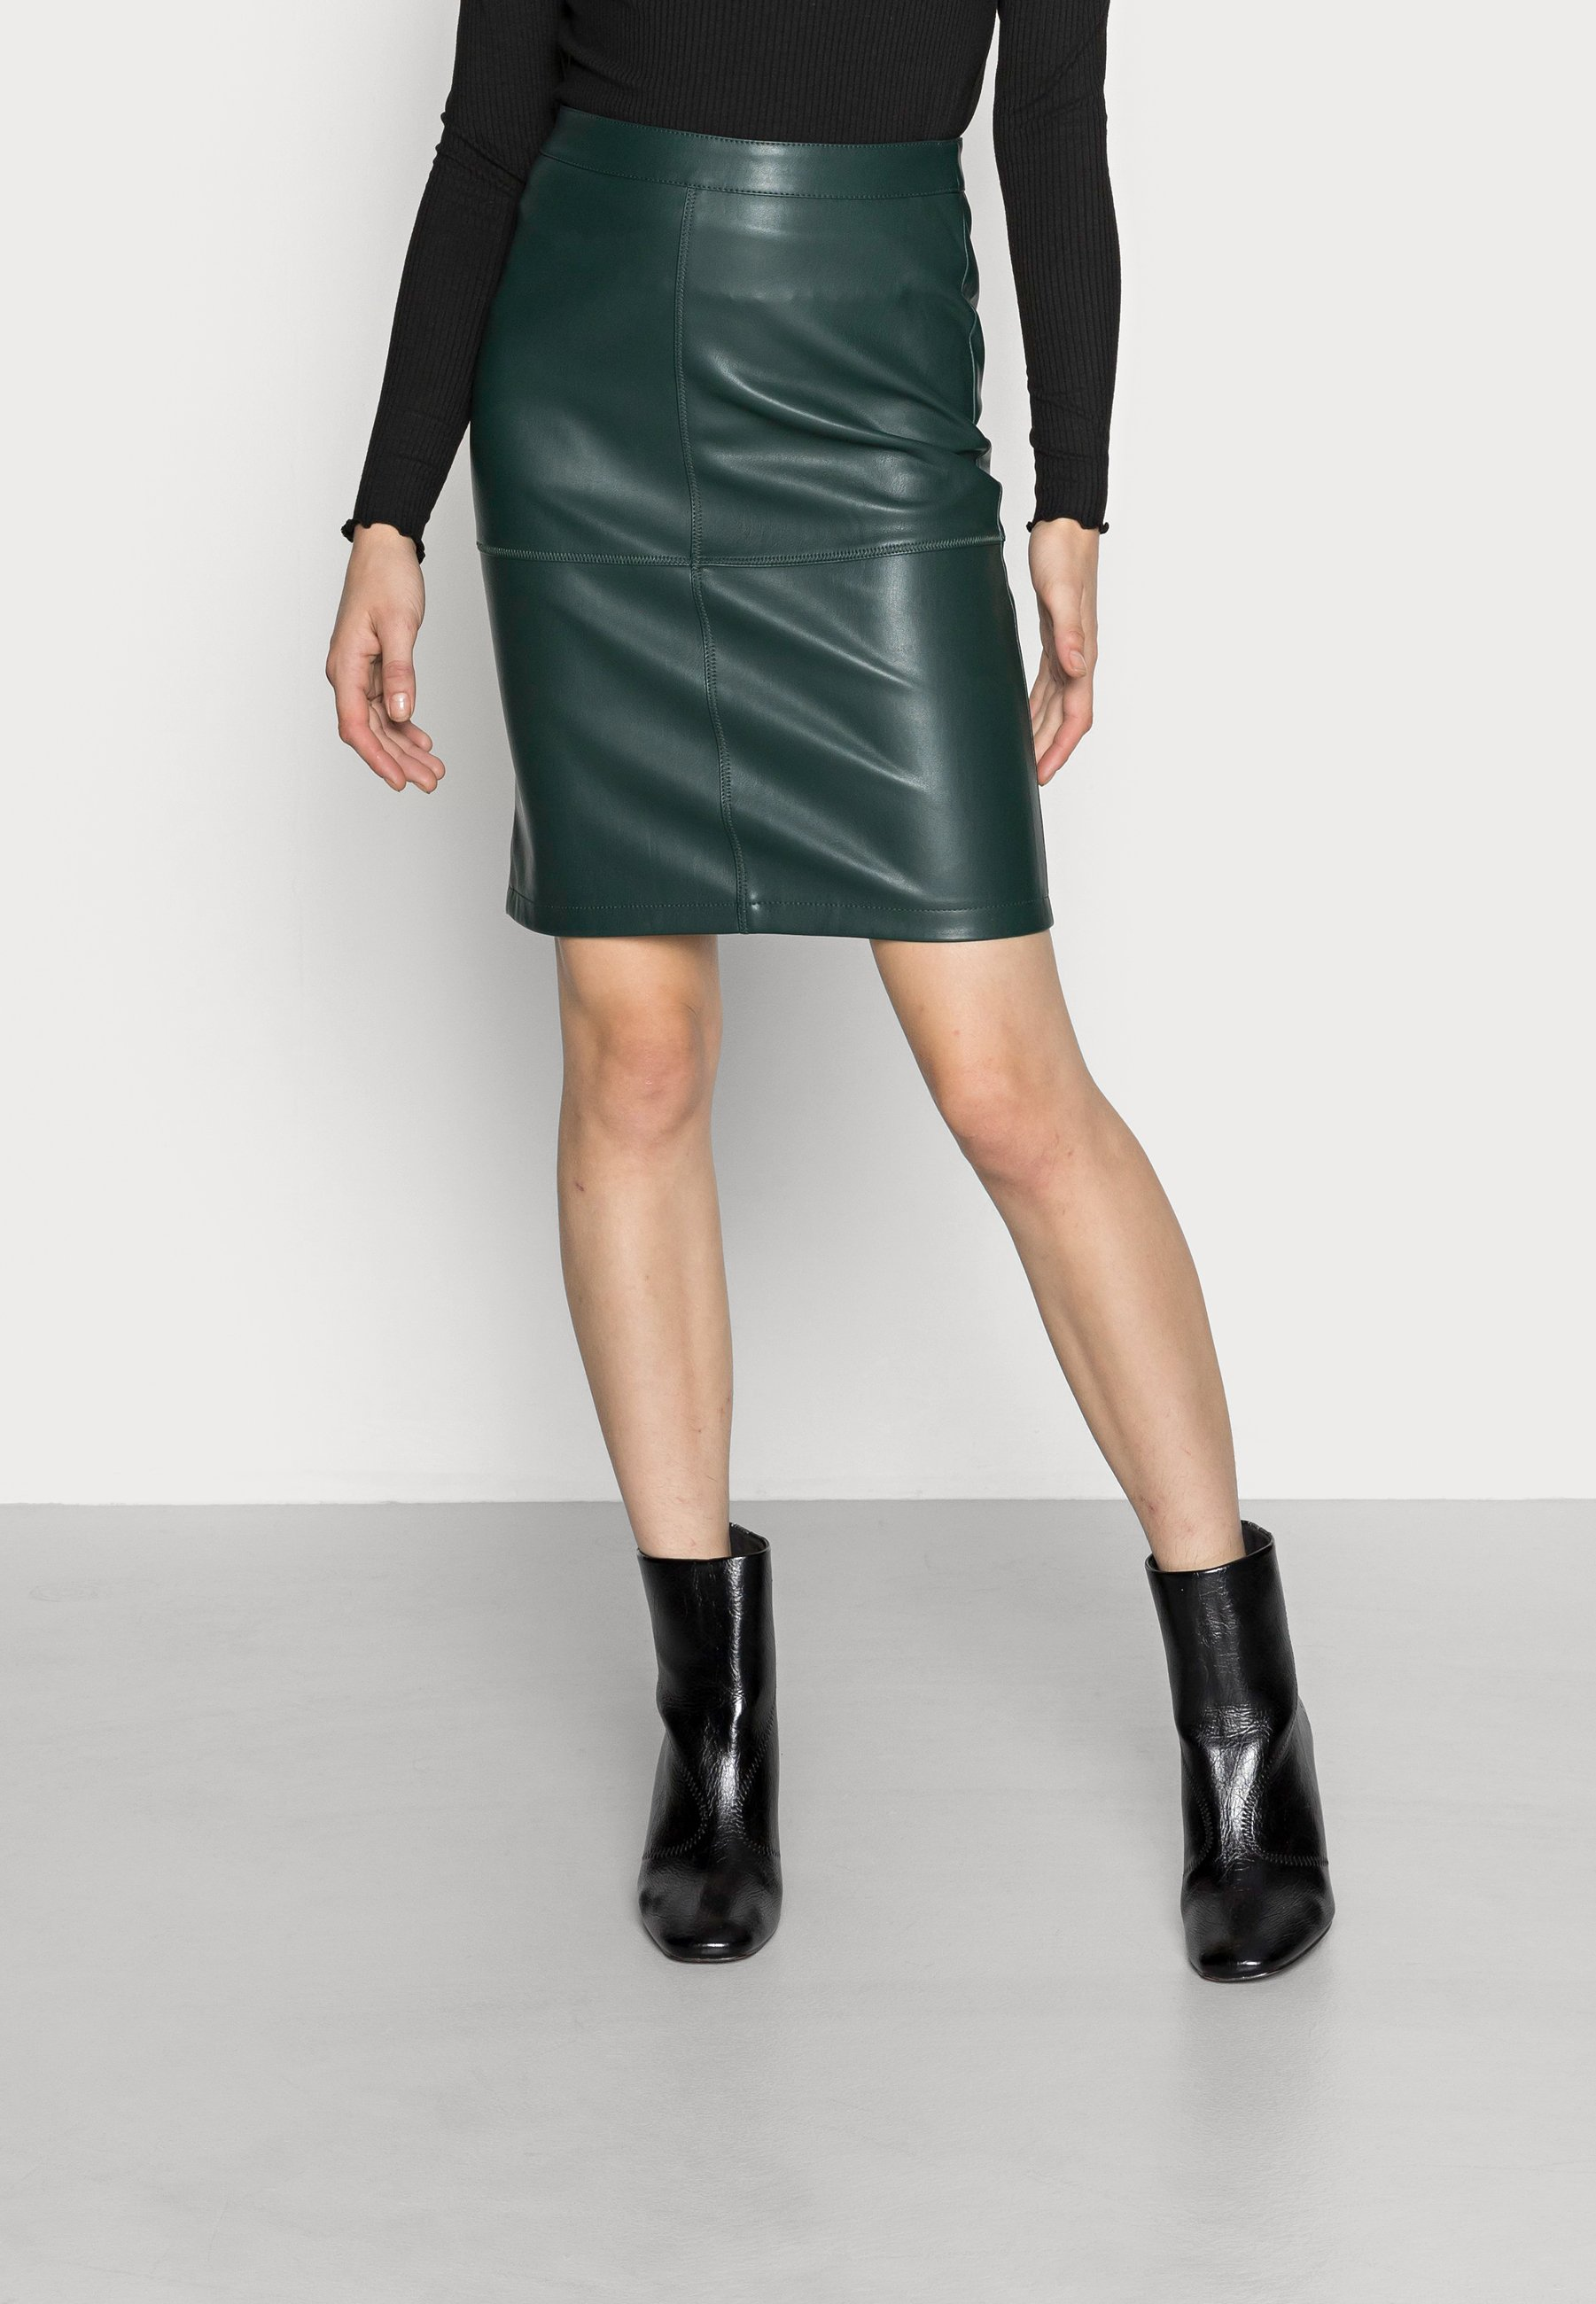 Femme VIPEN NEW SKIRT - Minijupe